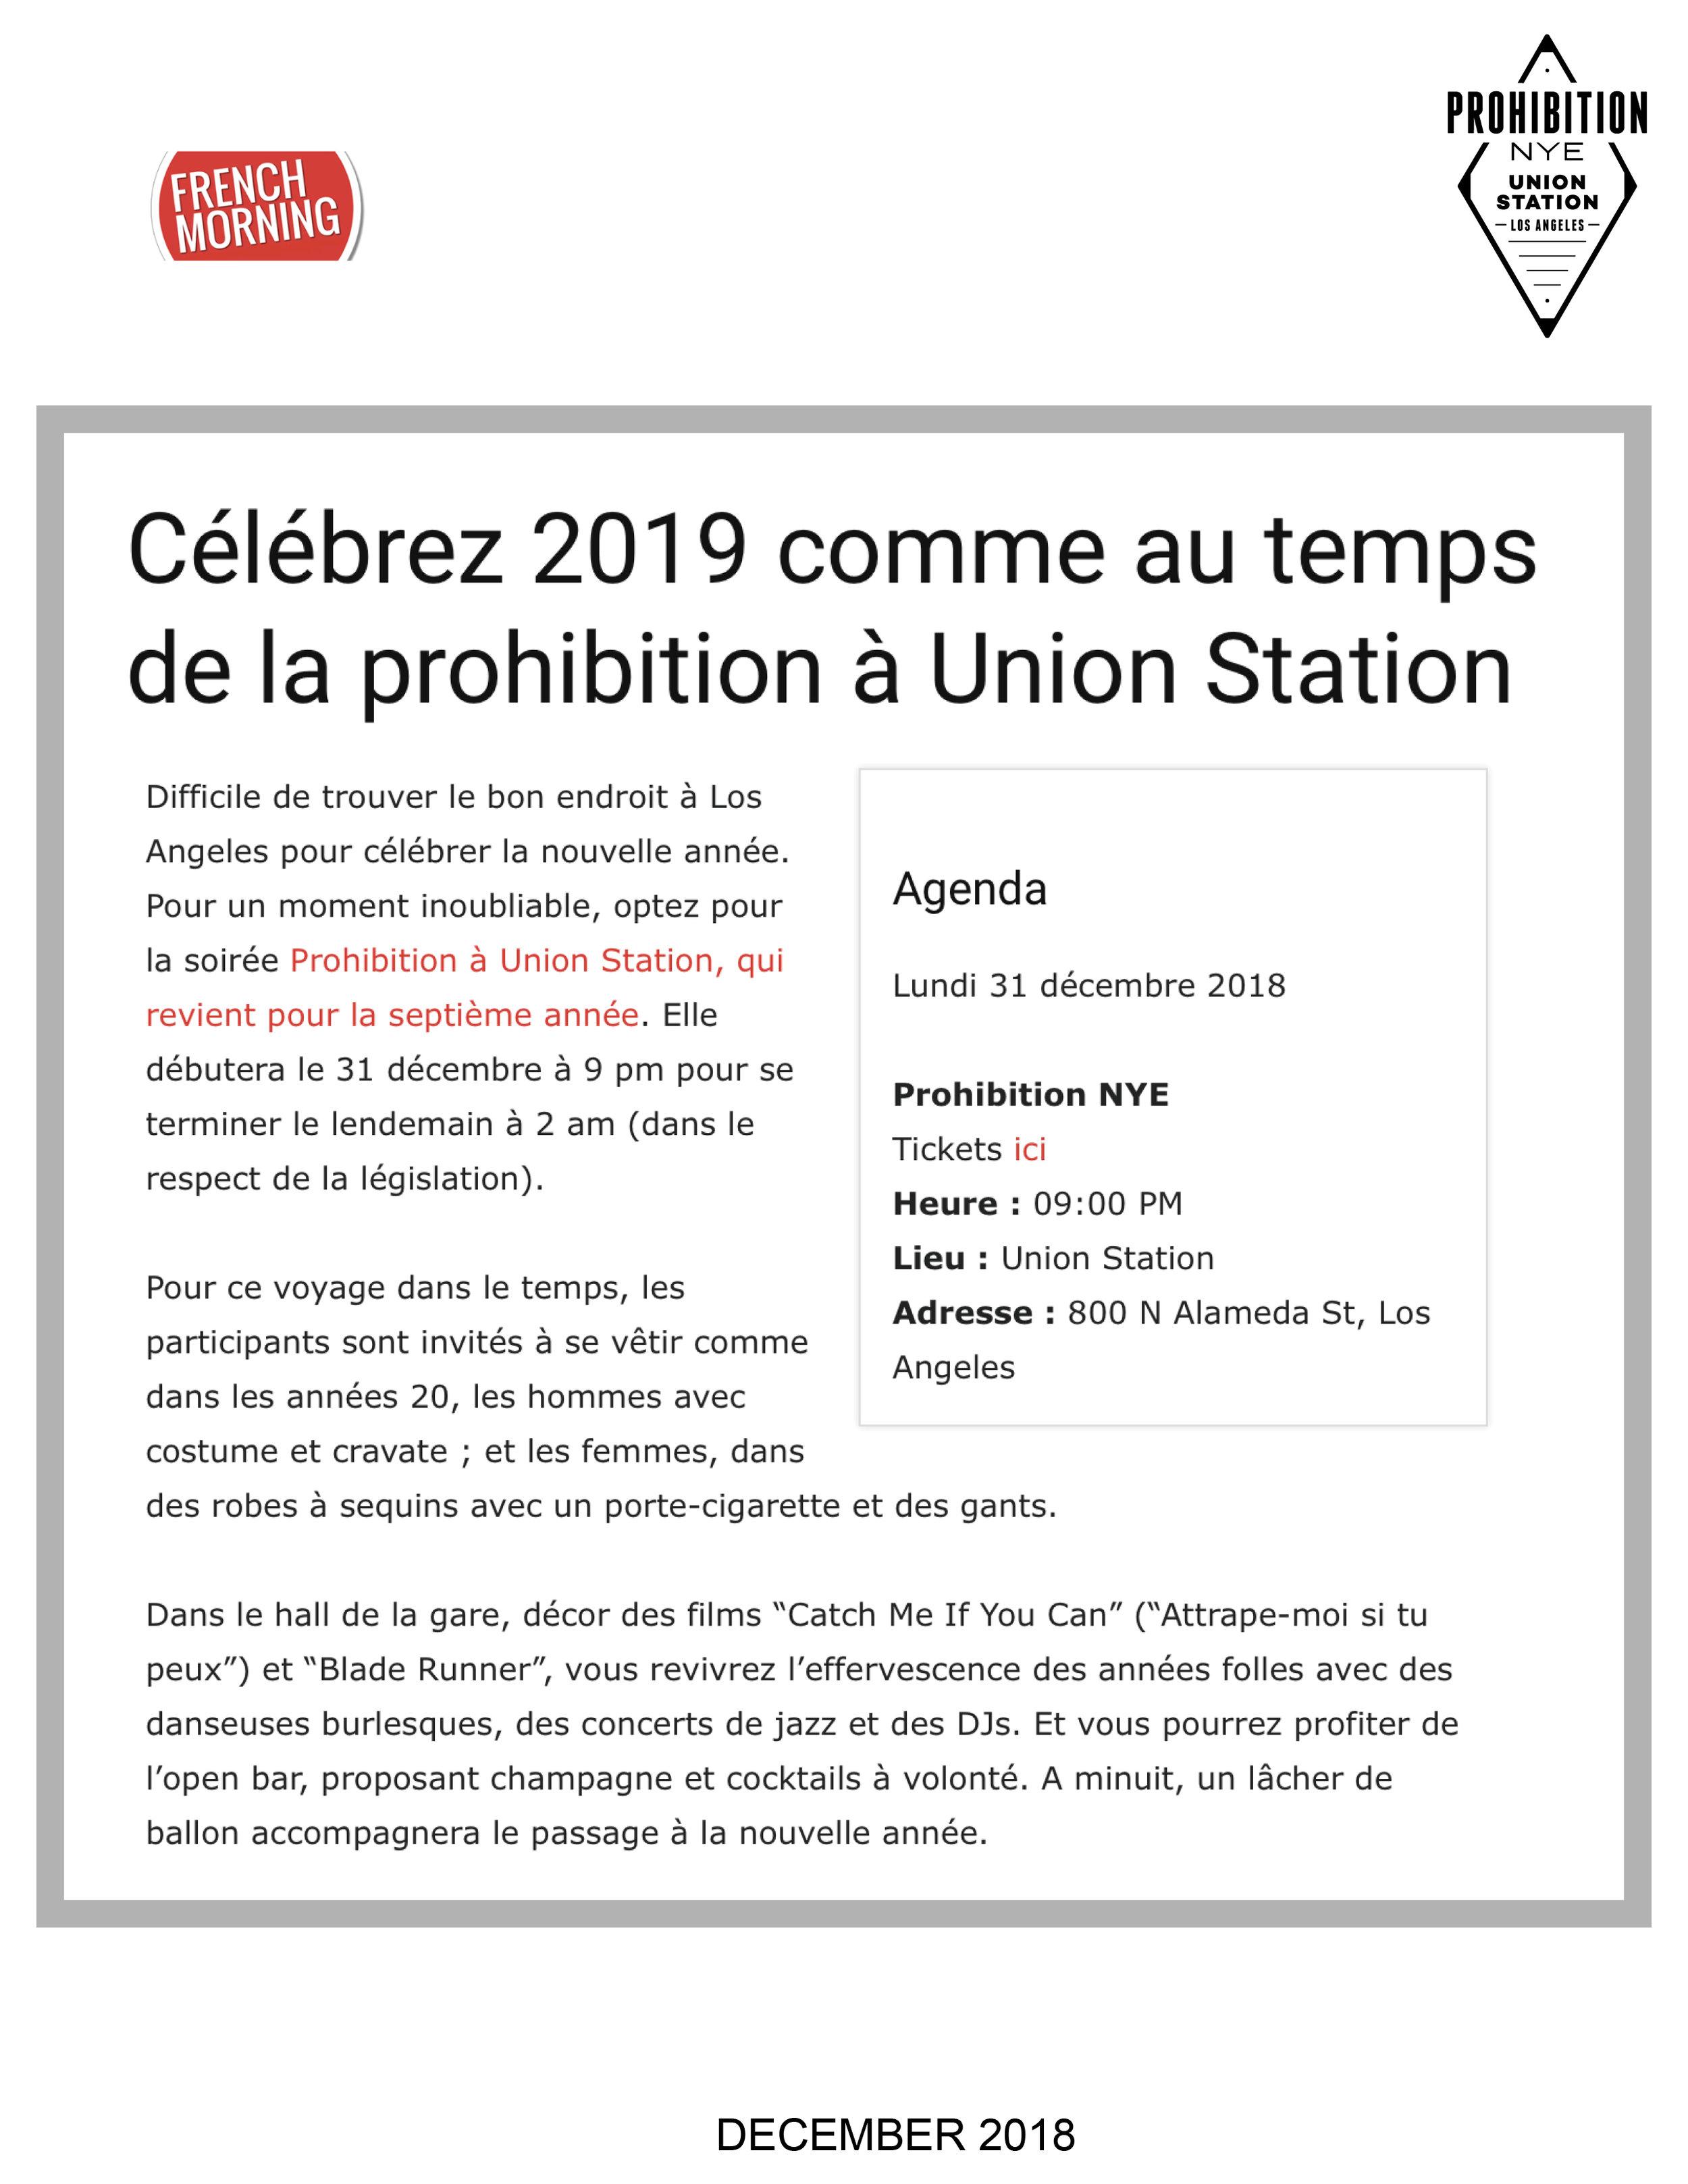 ProhibitionNYE_FrenchMorning_December2018.jpg